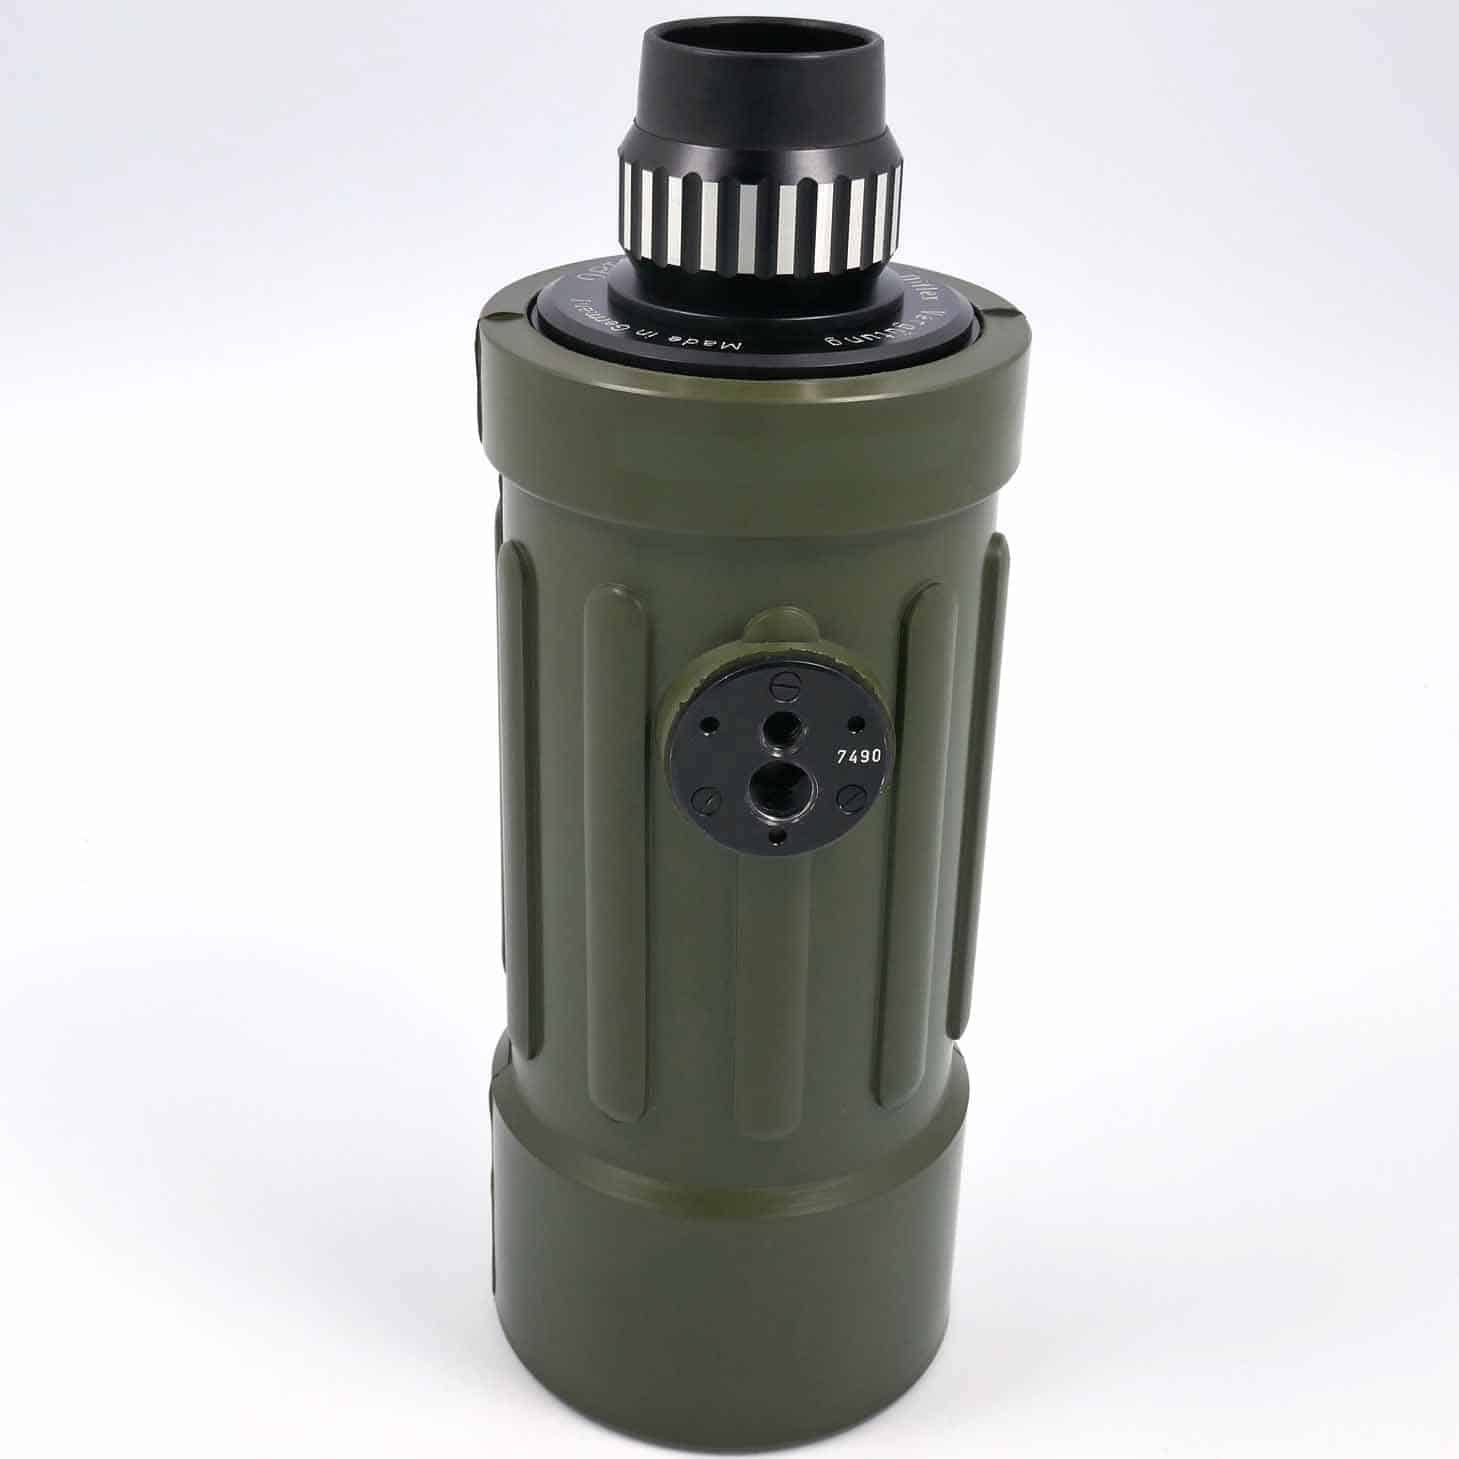 clean-cameras-optolyth-22x70-diflex-02